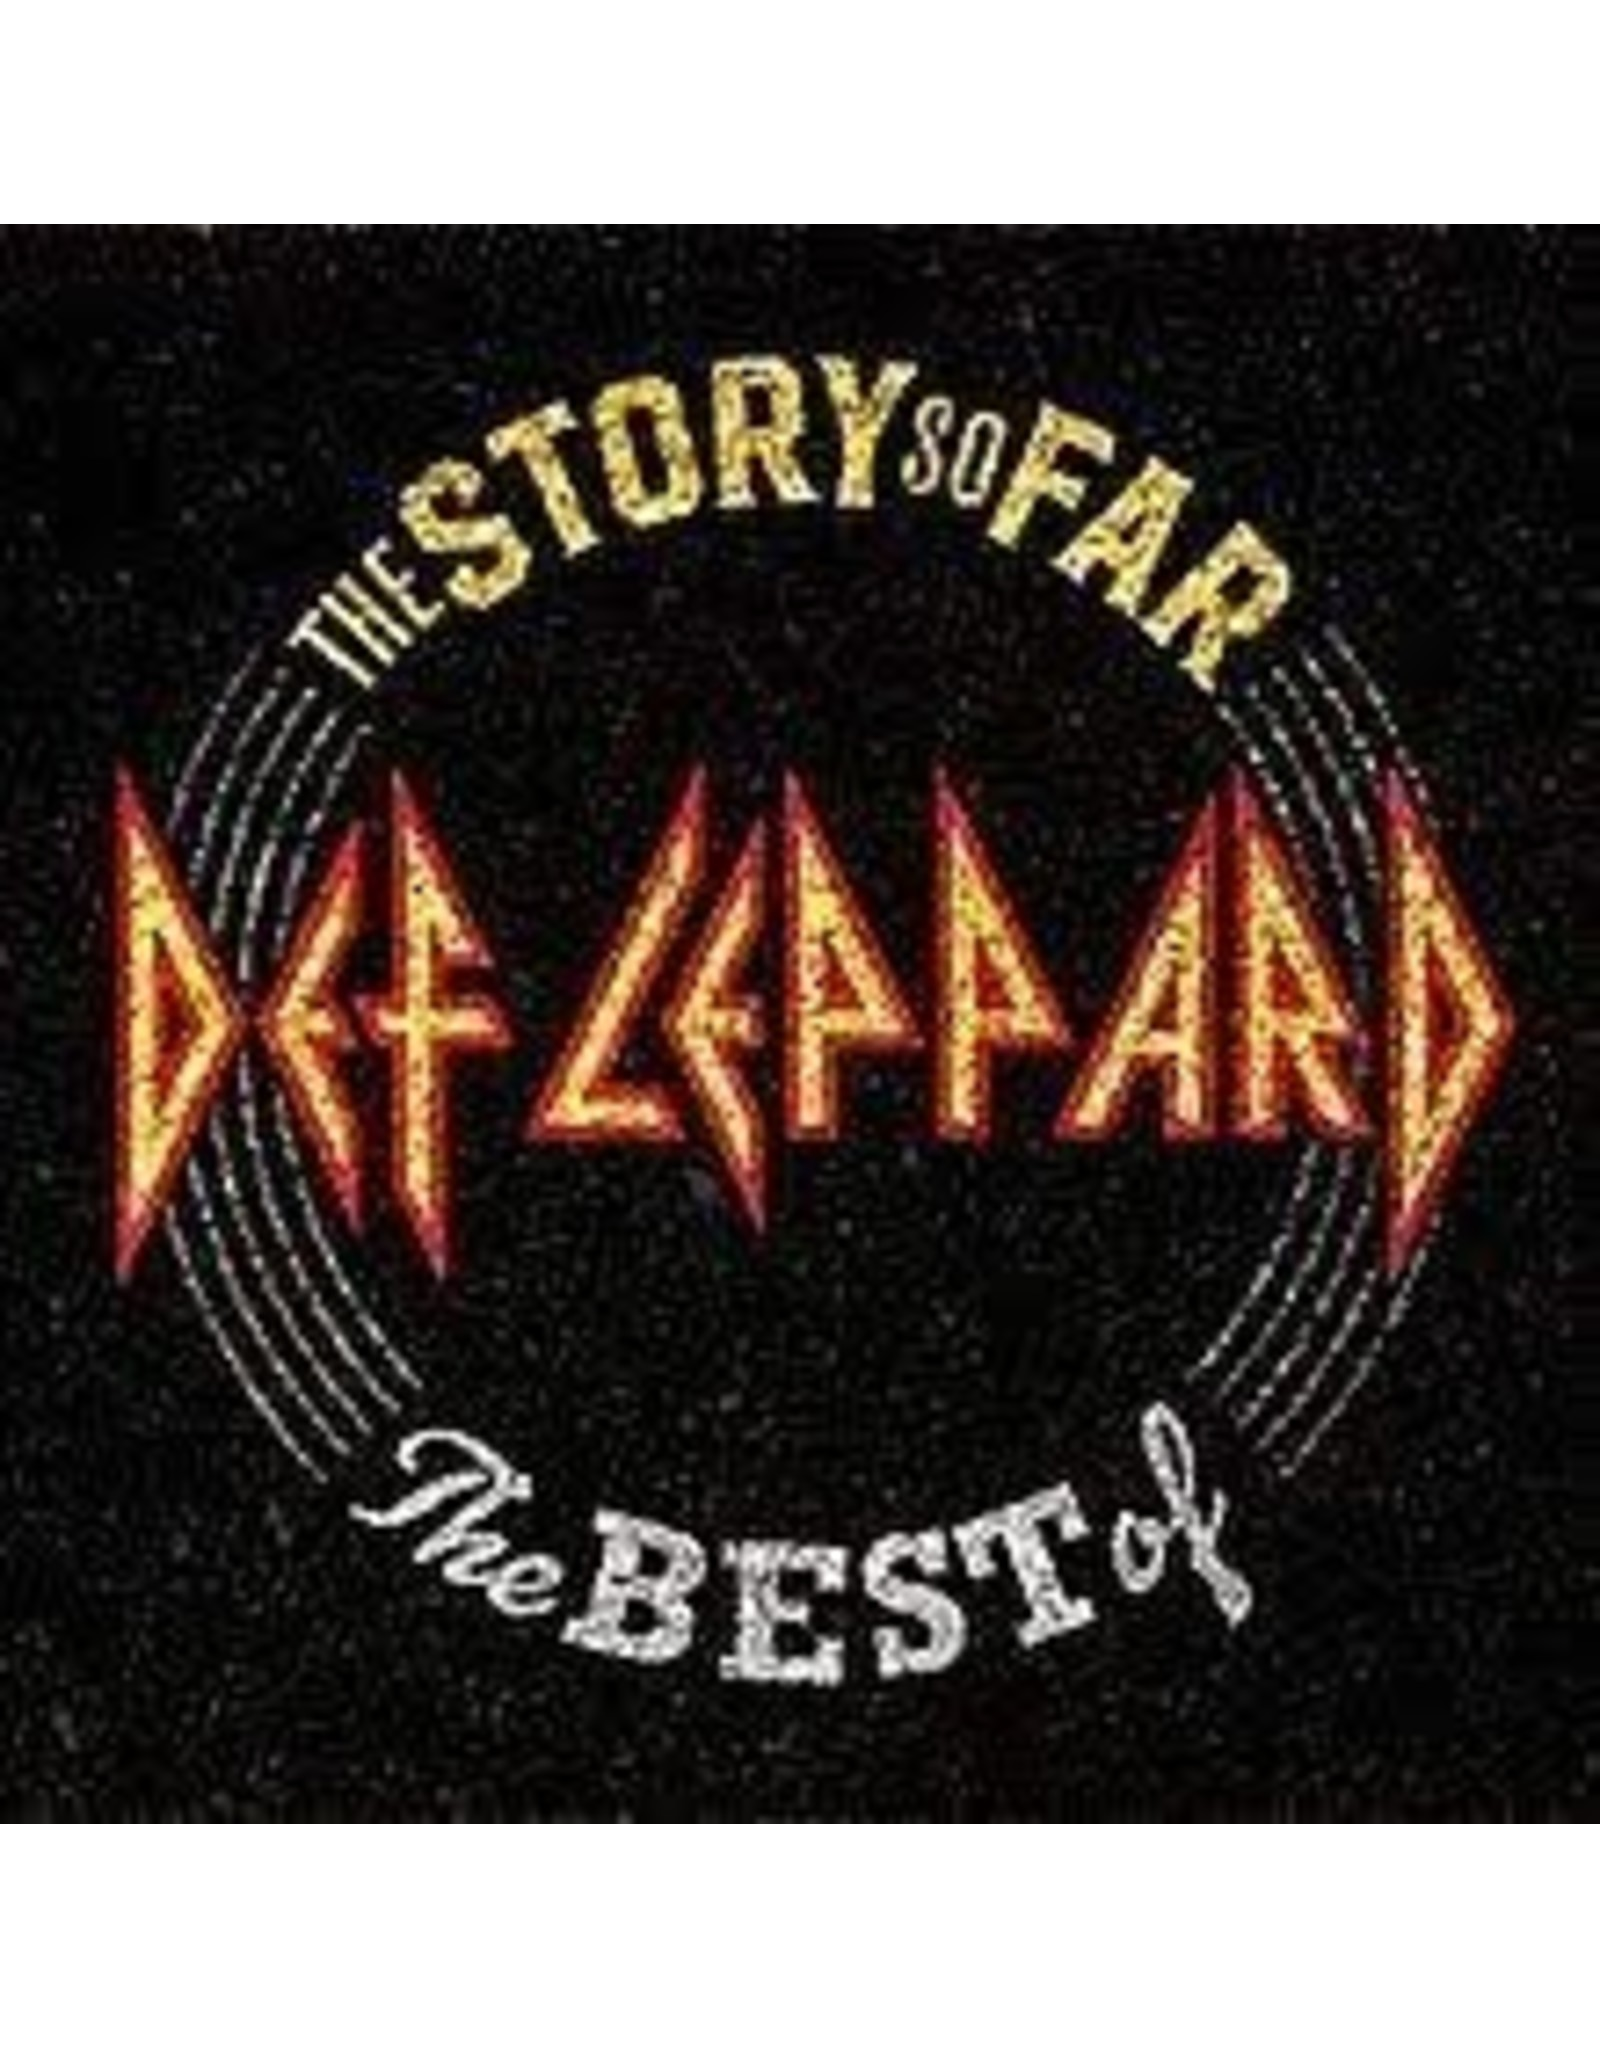 Def Leppard - Story So Far LP